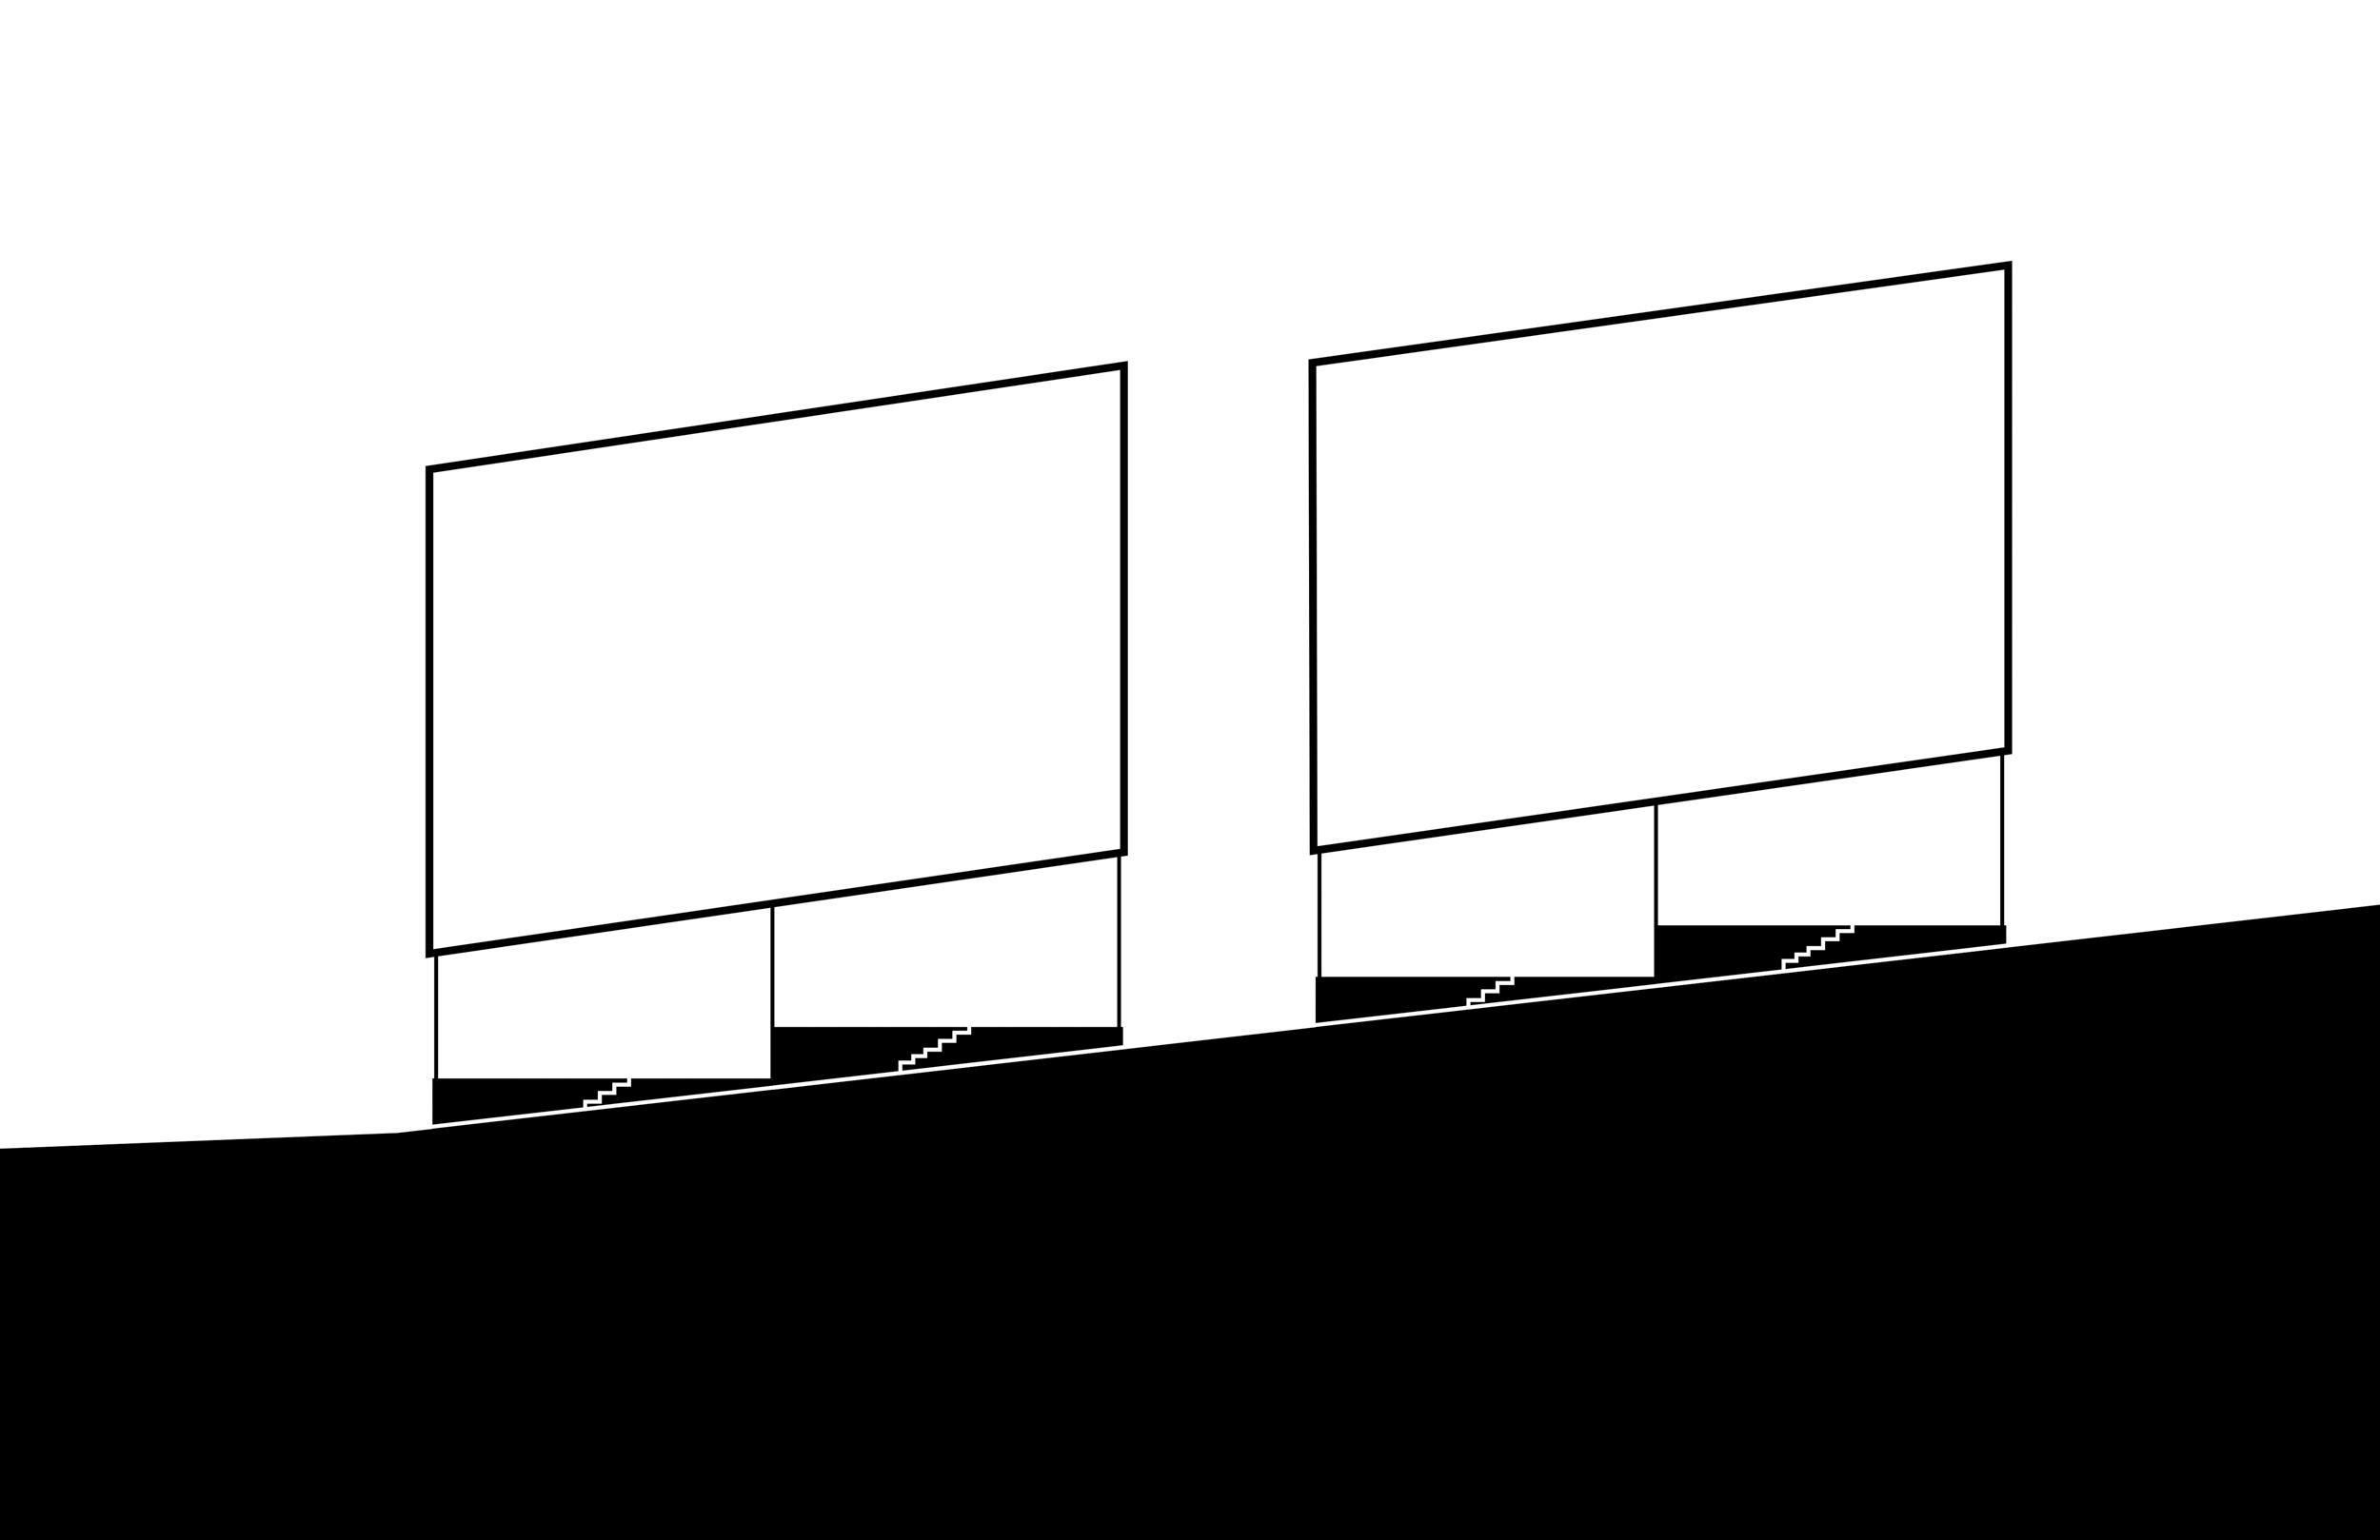 2302 G STREET - Diagram 5.jpg